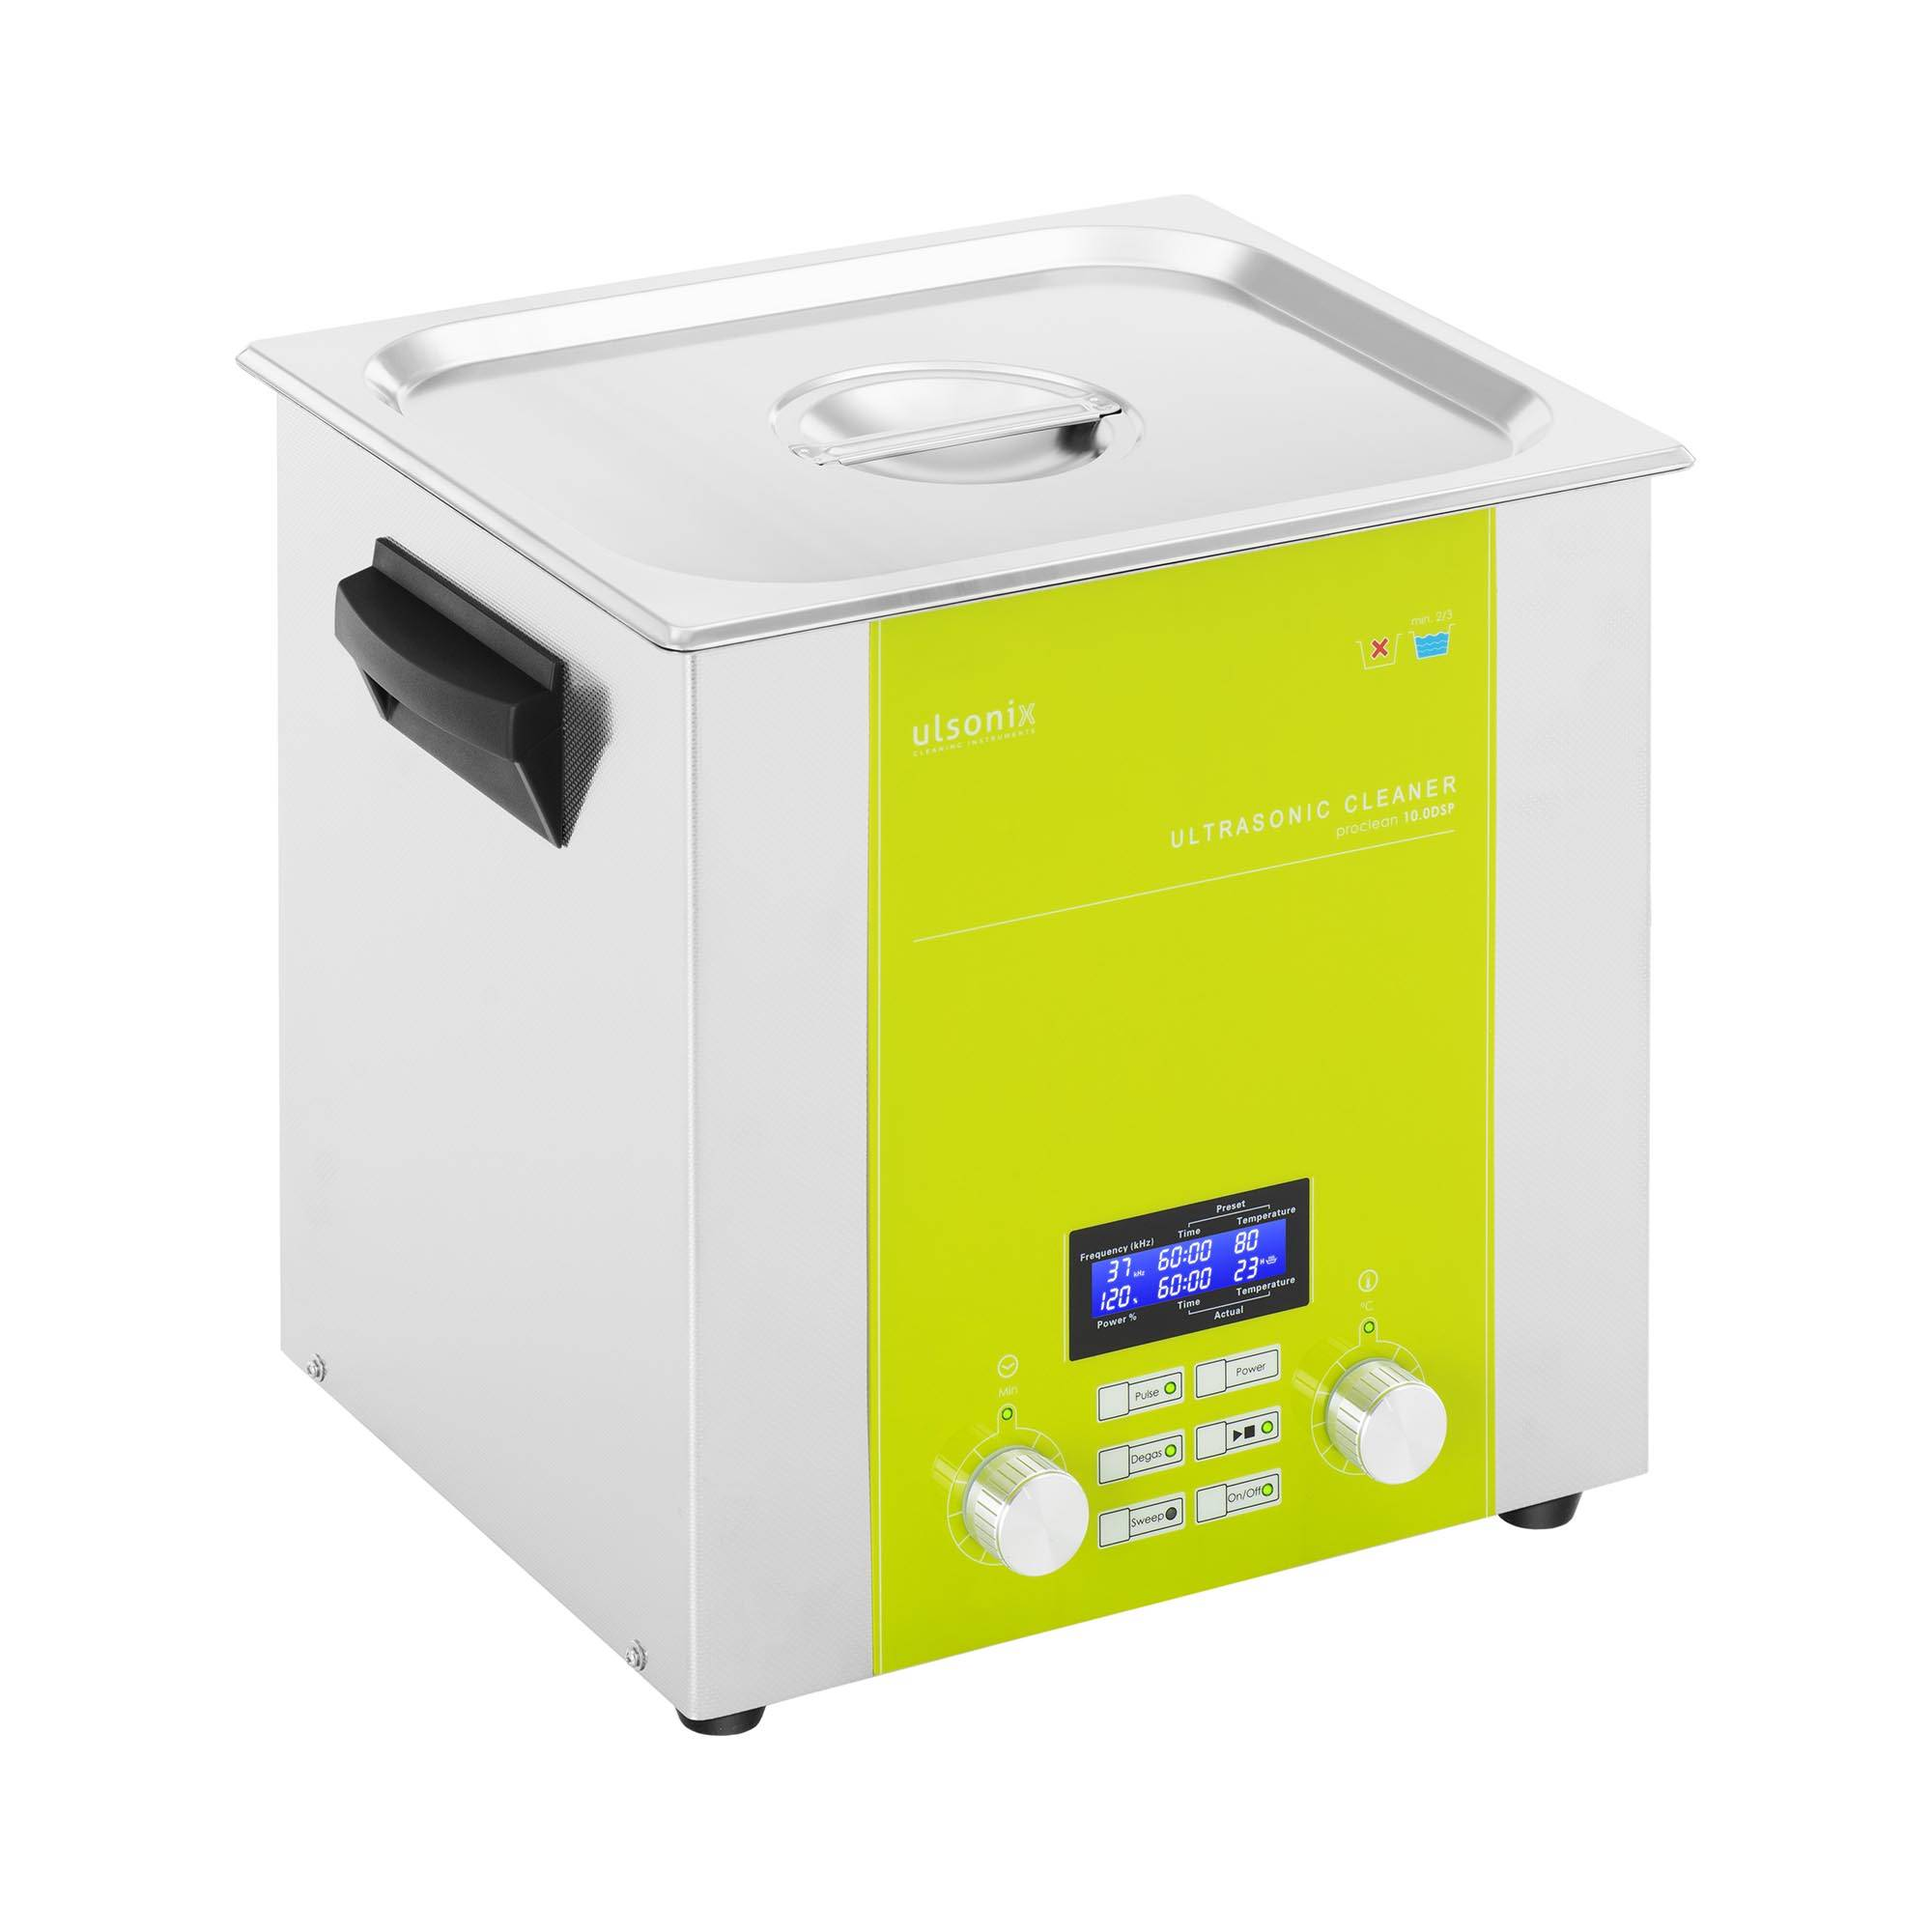 ulsonix Nettoyeur à ultrasons - 10 litres - Degas - Sweep - Puls PROCLEAN 10.0DSP